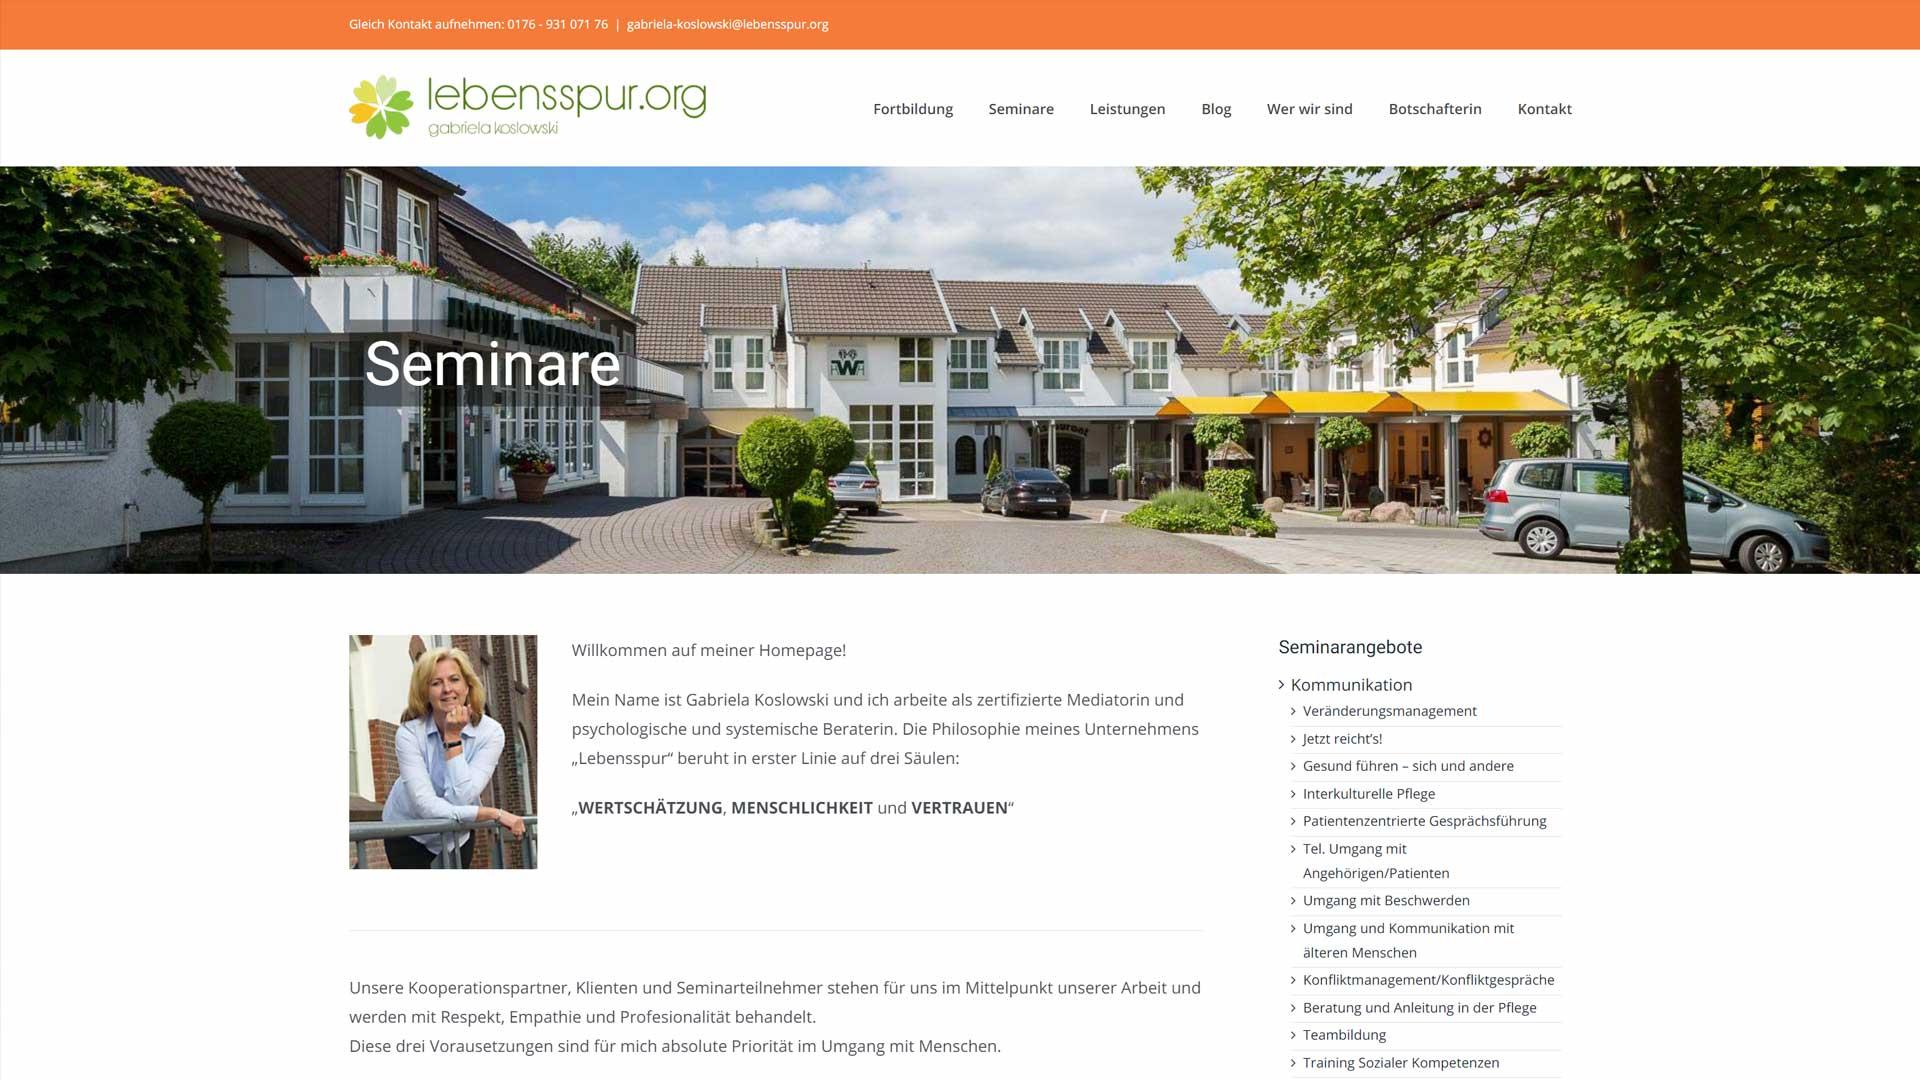 Screenshot: Homepage Lebensspur.org